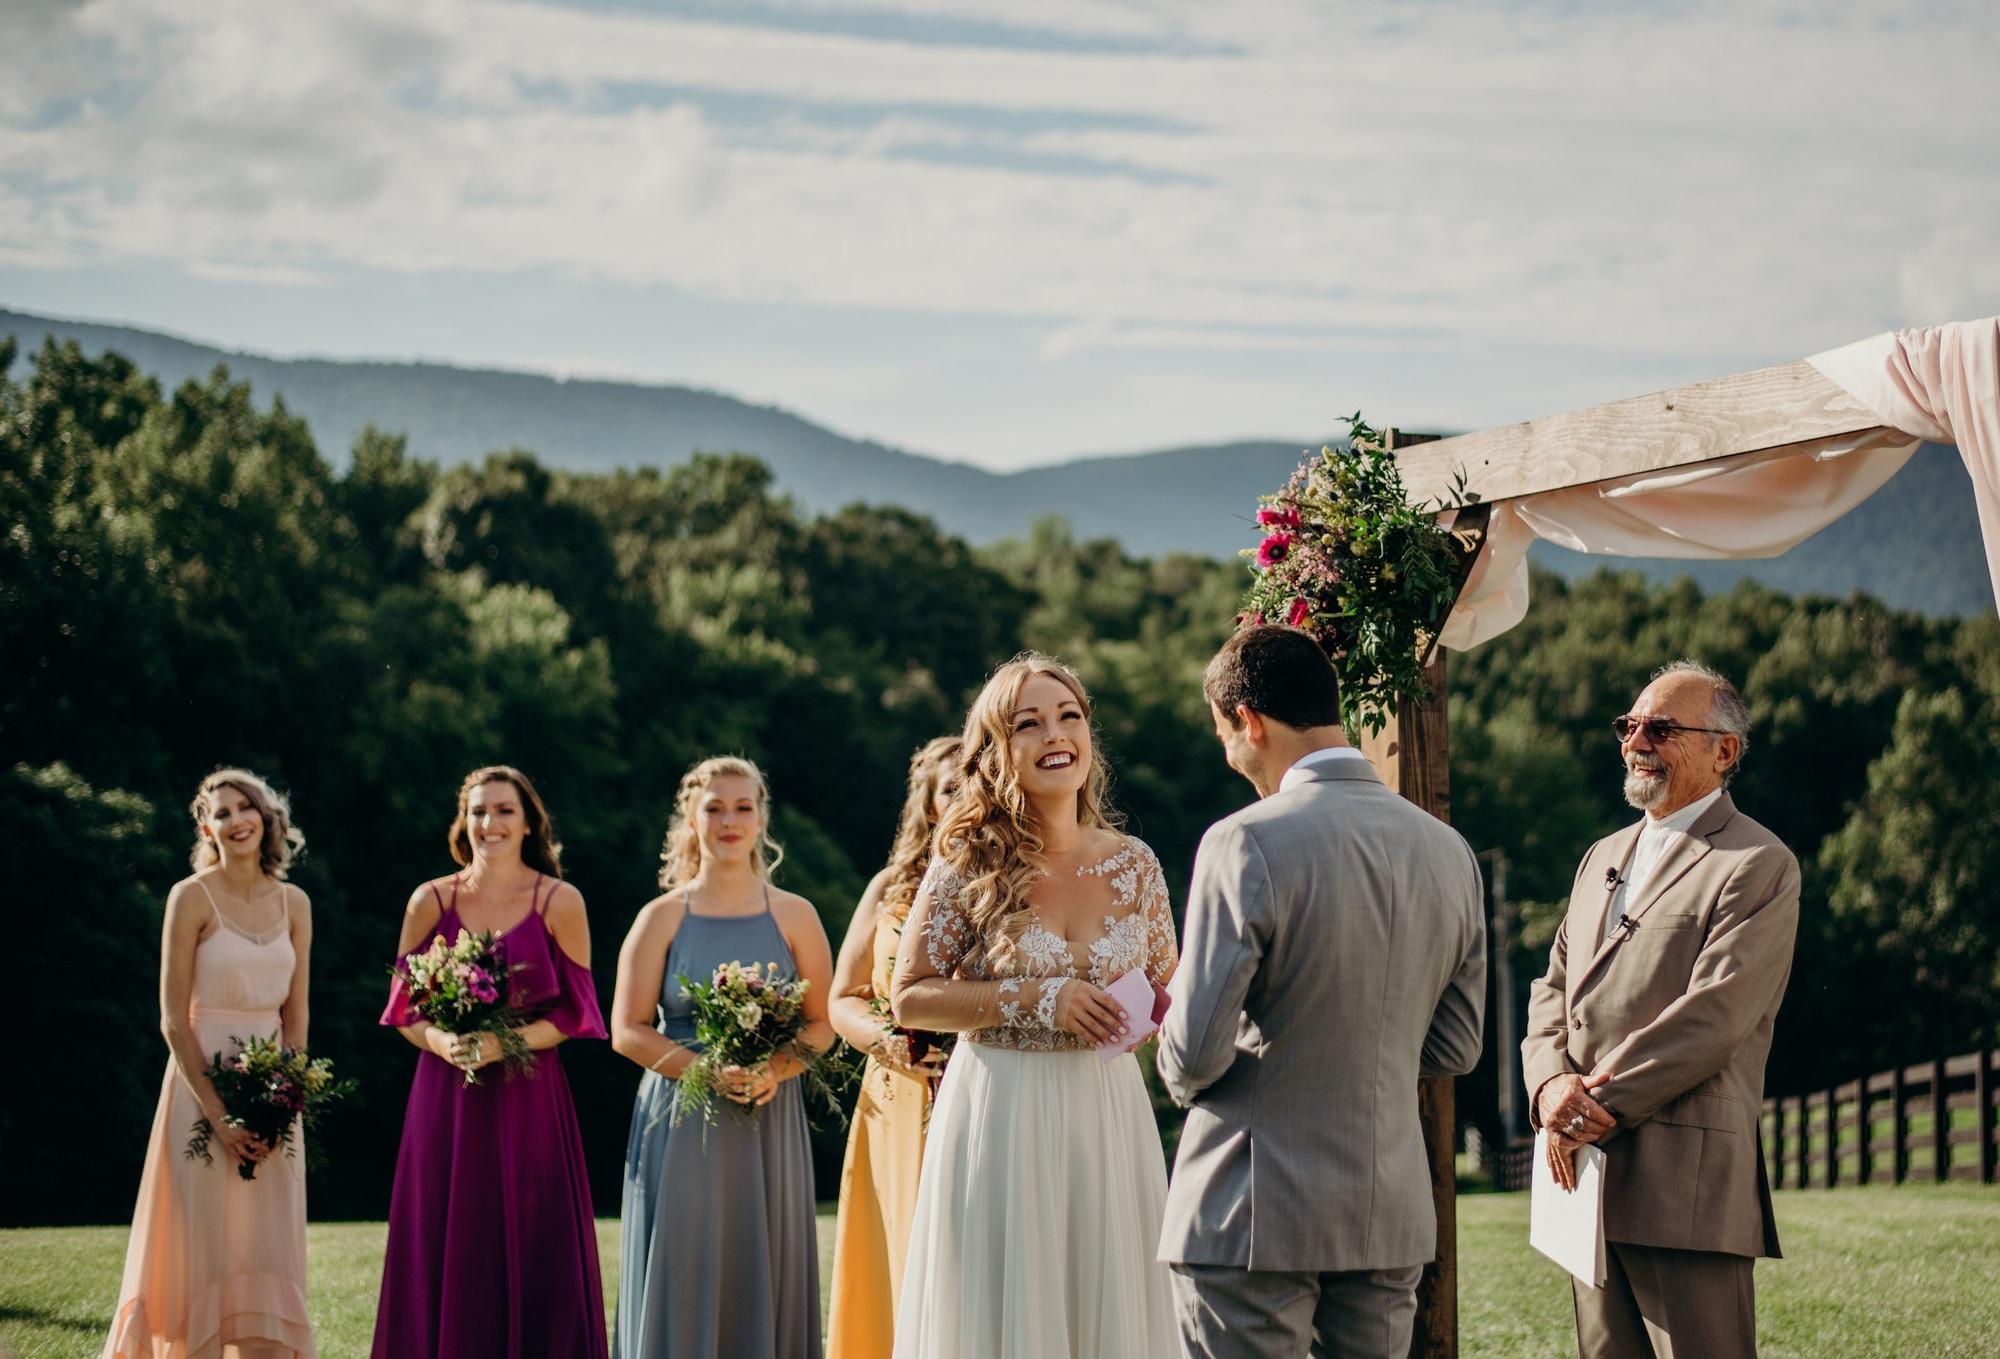 ryan-lauren-wedding-at-montfair-resort-farm-lindsey-paradiso-photography-1738.jpg